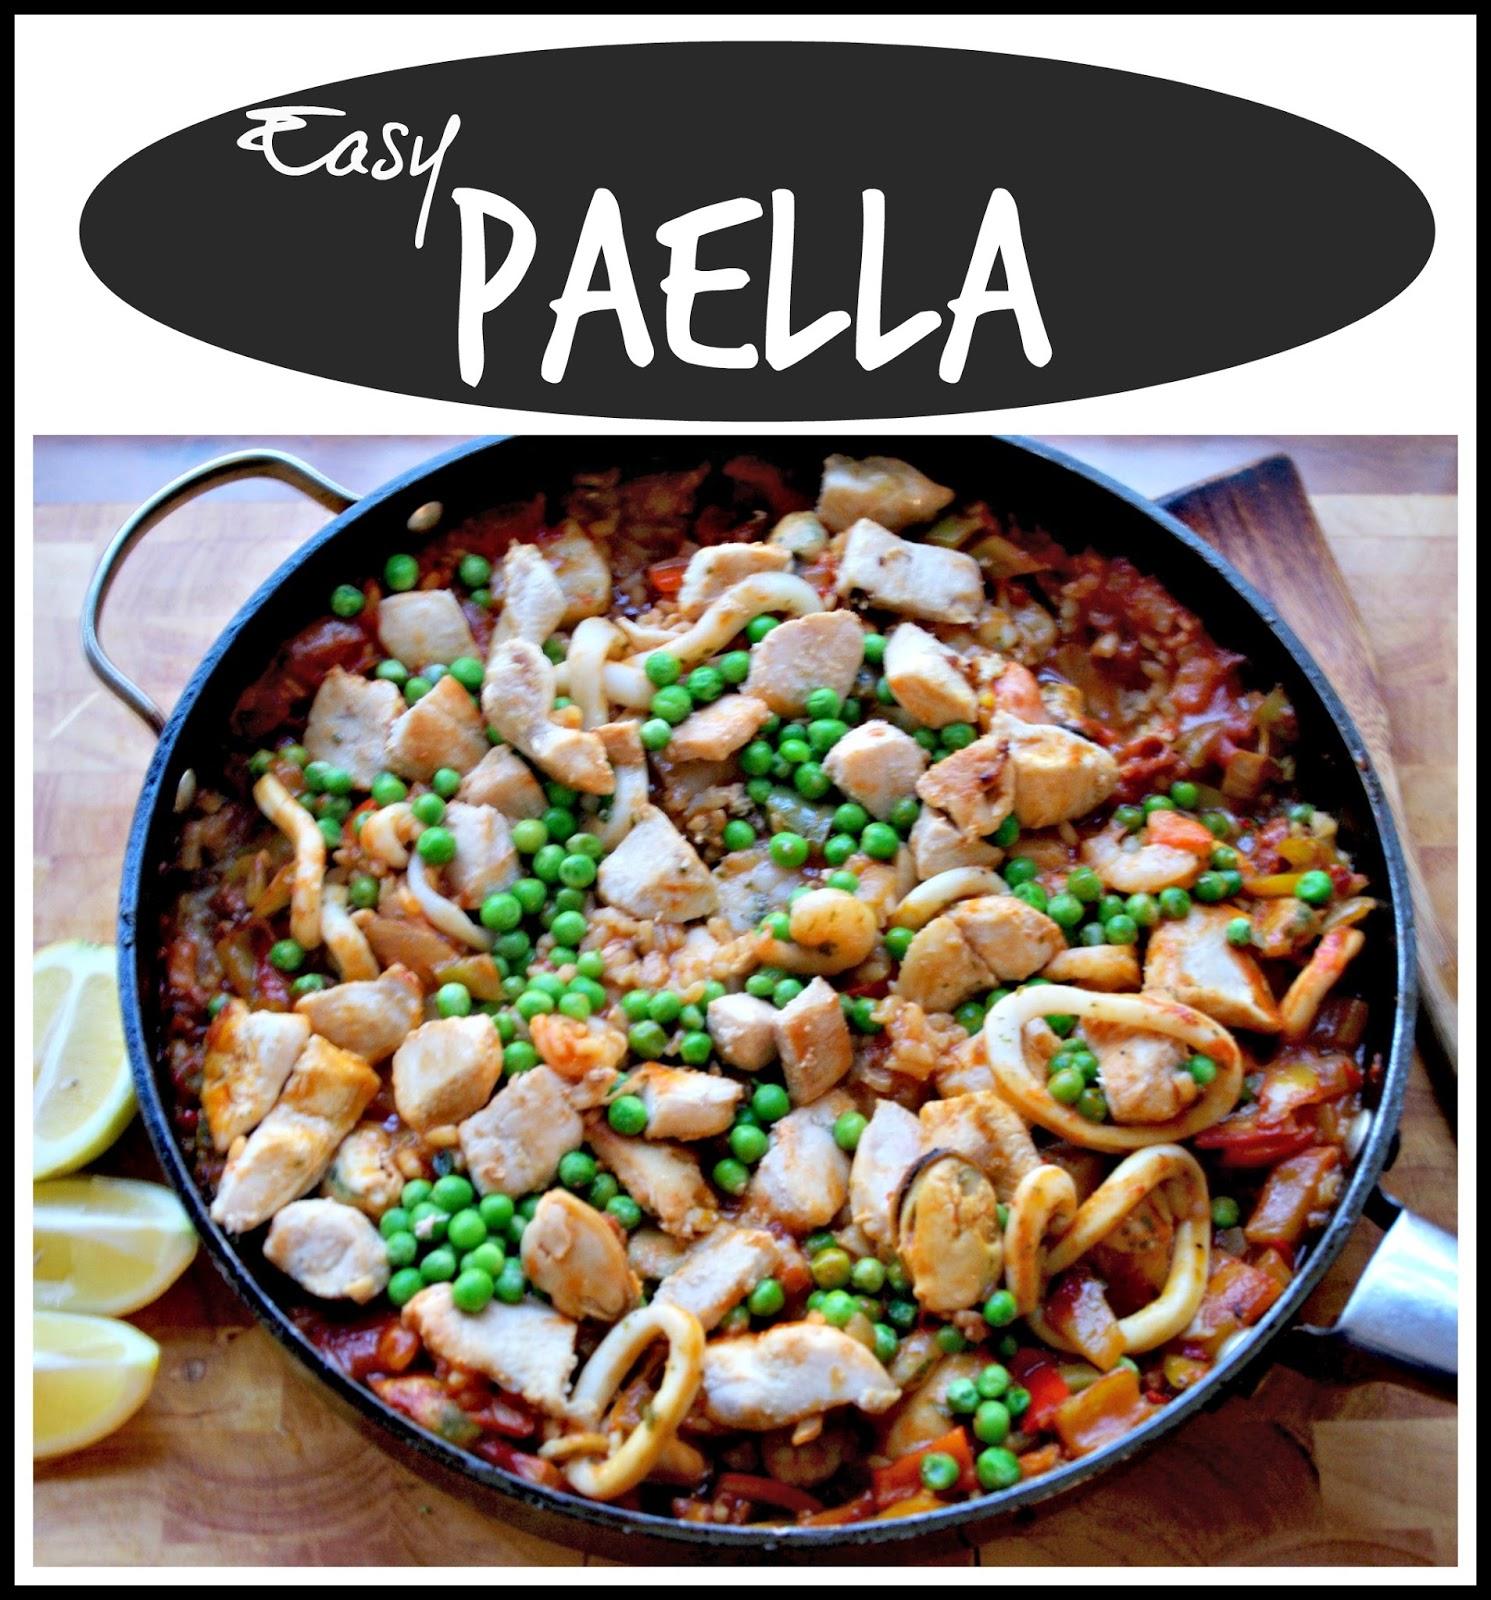 the nOATbook: Recipe: Easy Paella